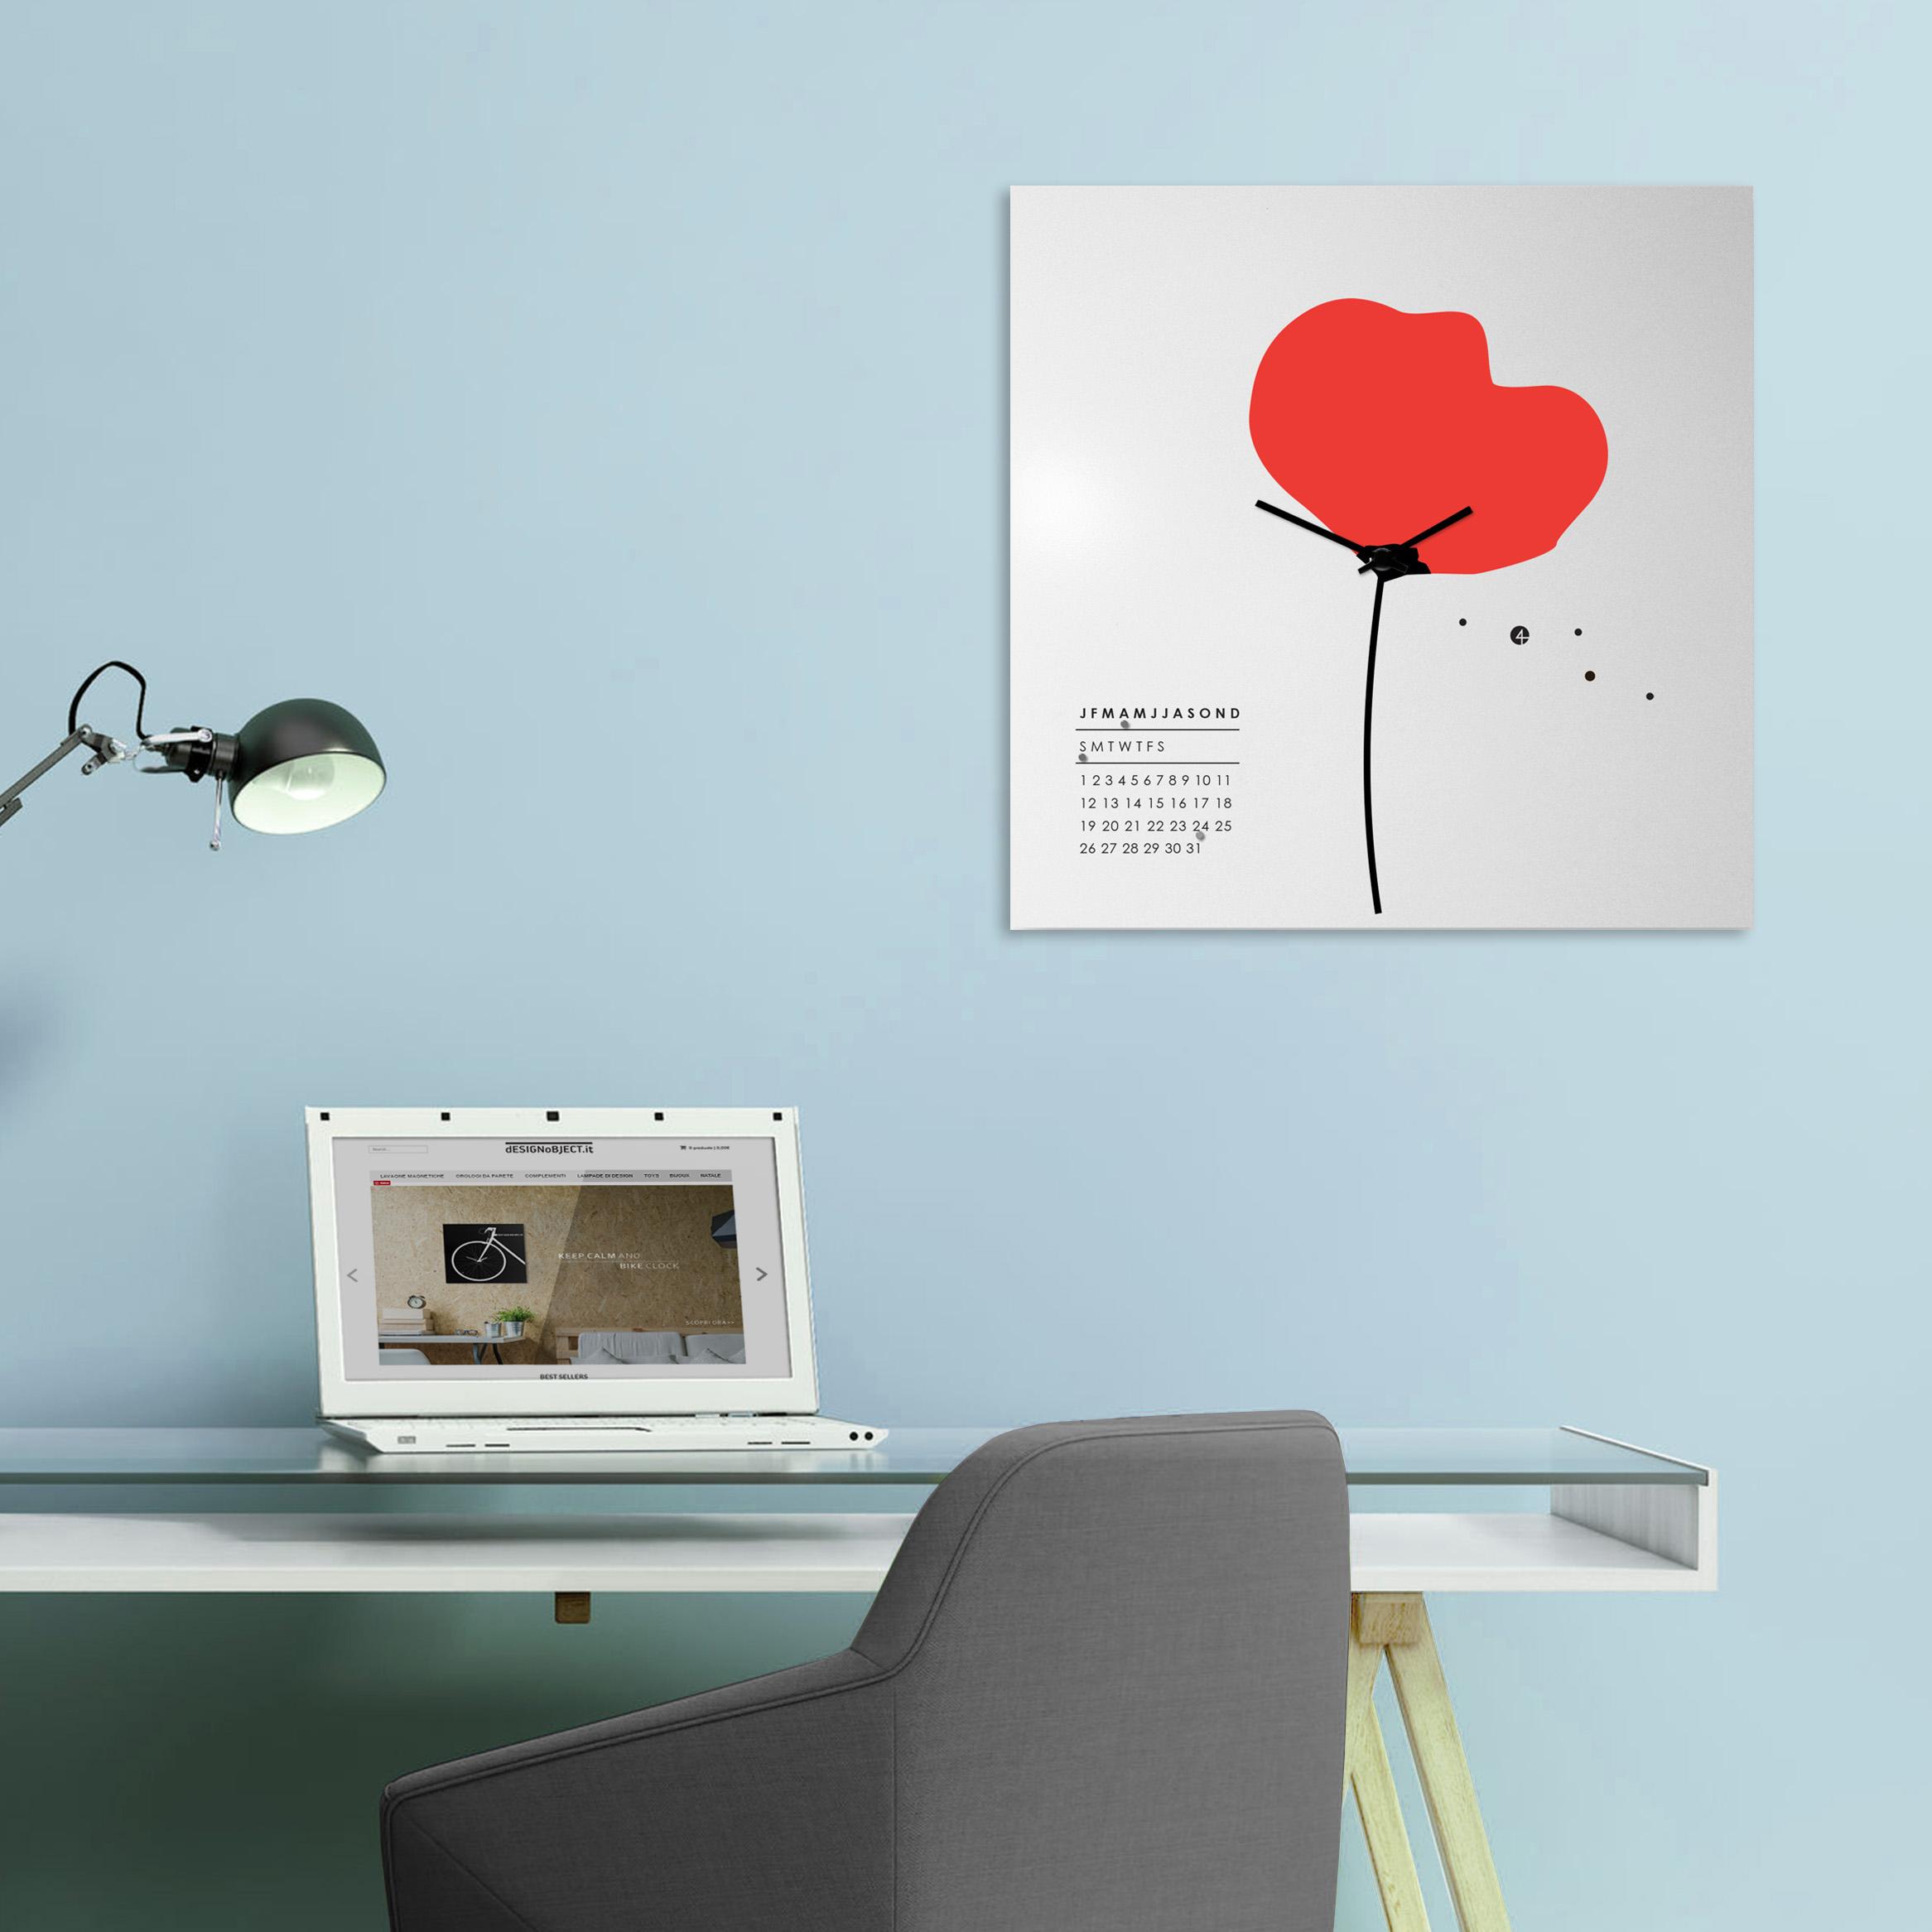 orologio-parete-design-calendario-perpetuo-wall-clock-perpetual-calendar-design-mood-papavero